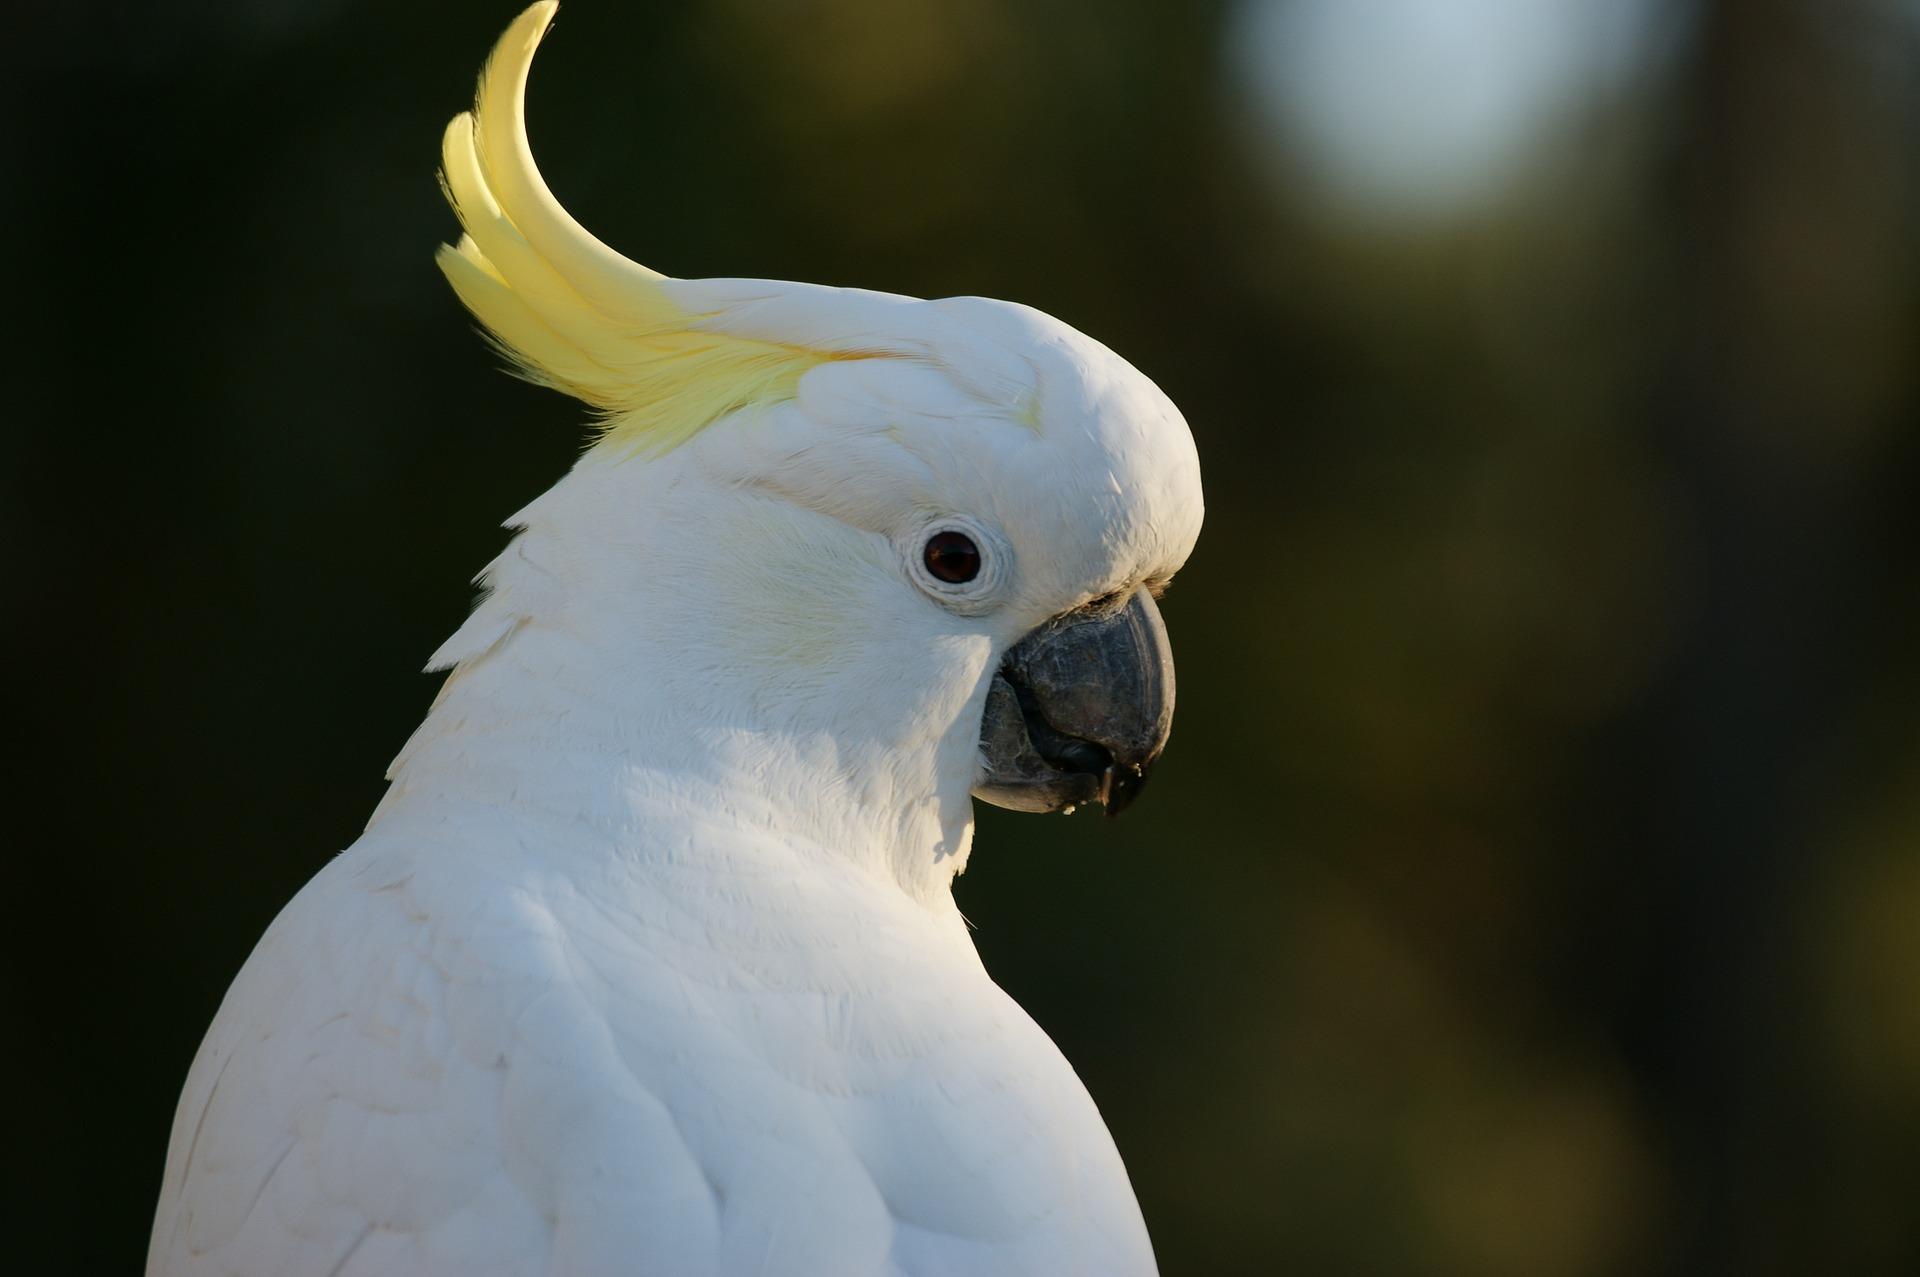 cockatoo-583921_1920